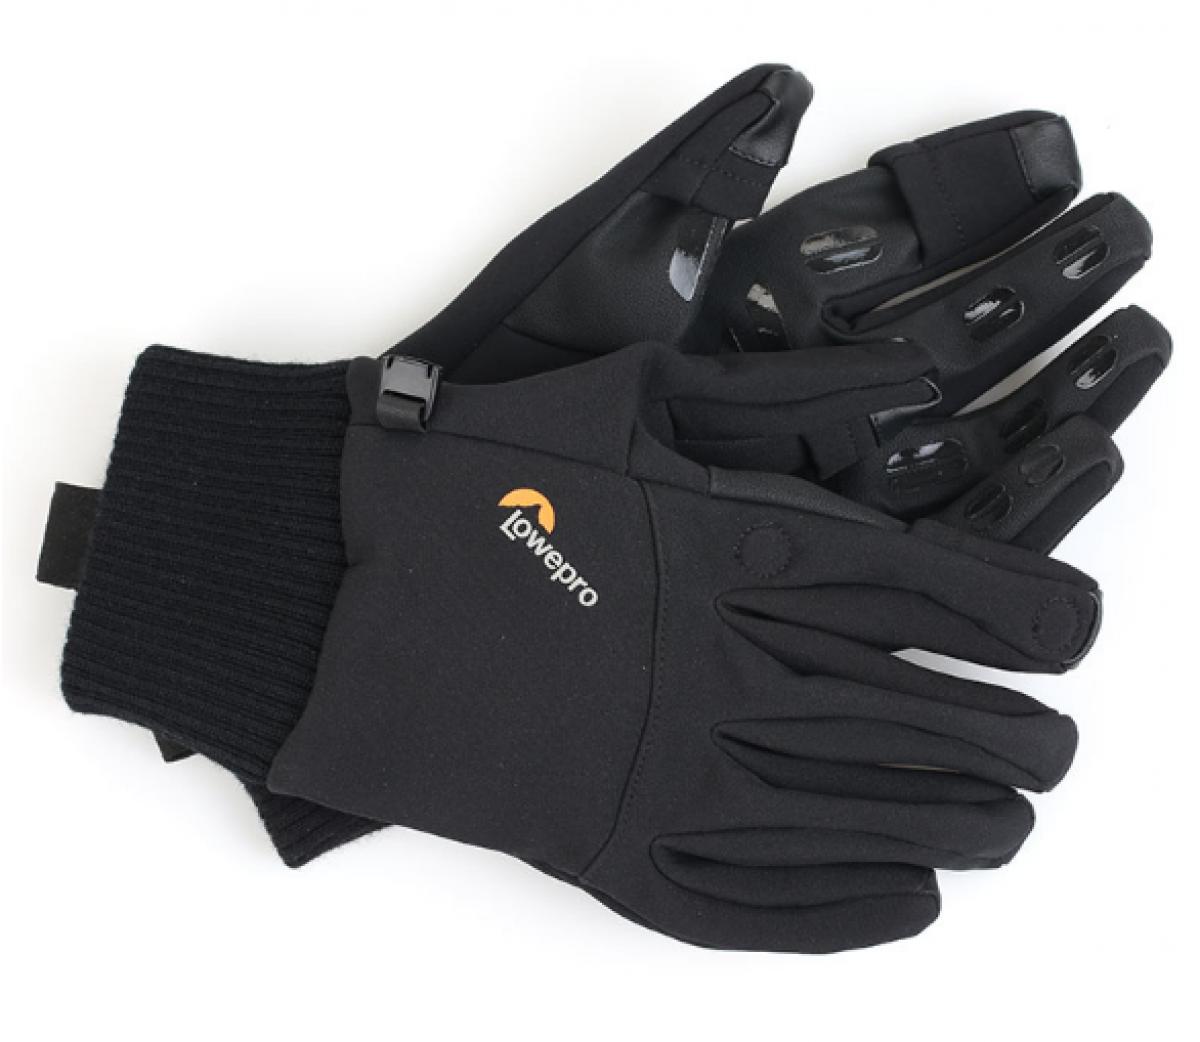 LOWEPRO ProTactic Photo Gloves M rukavice